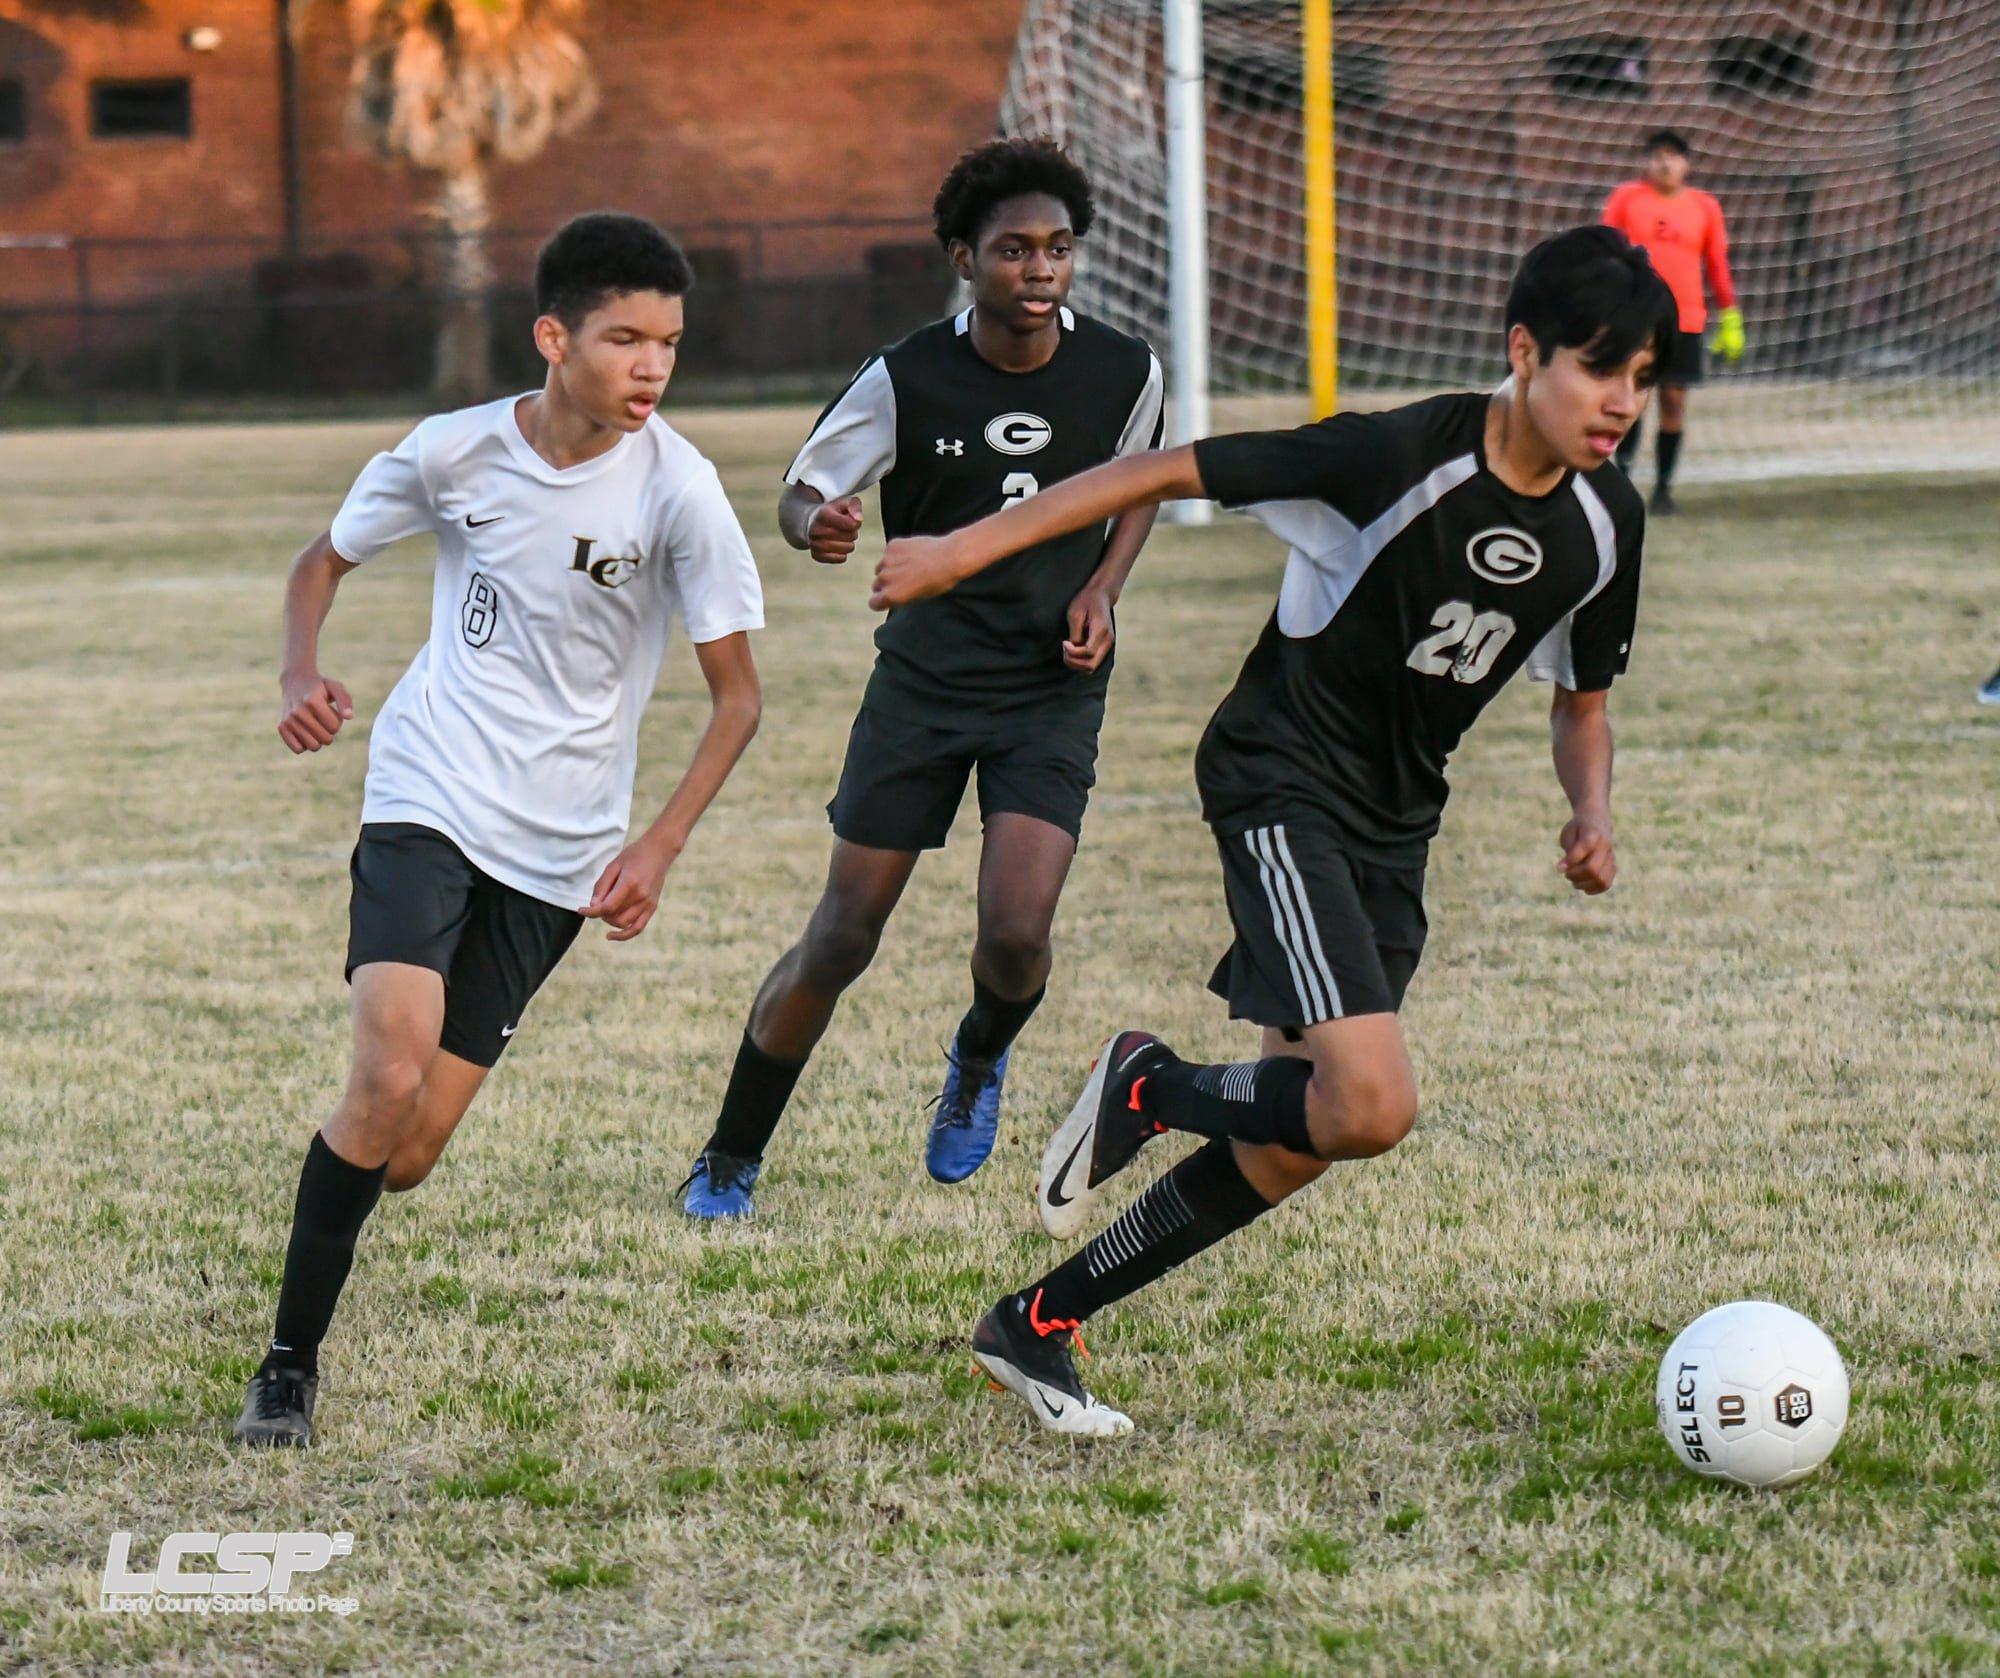 soccerboys4